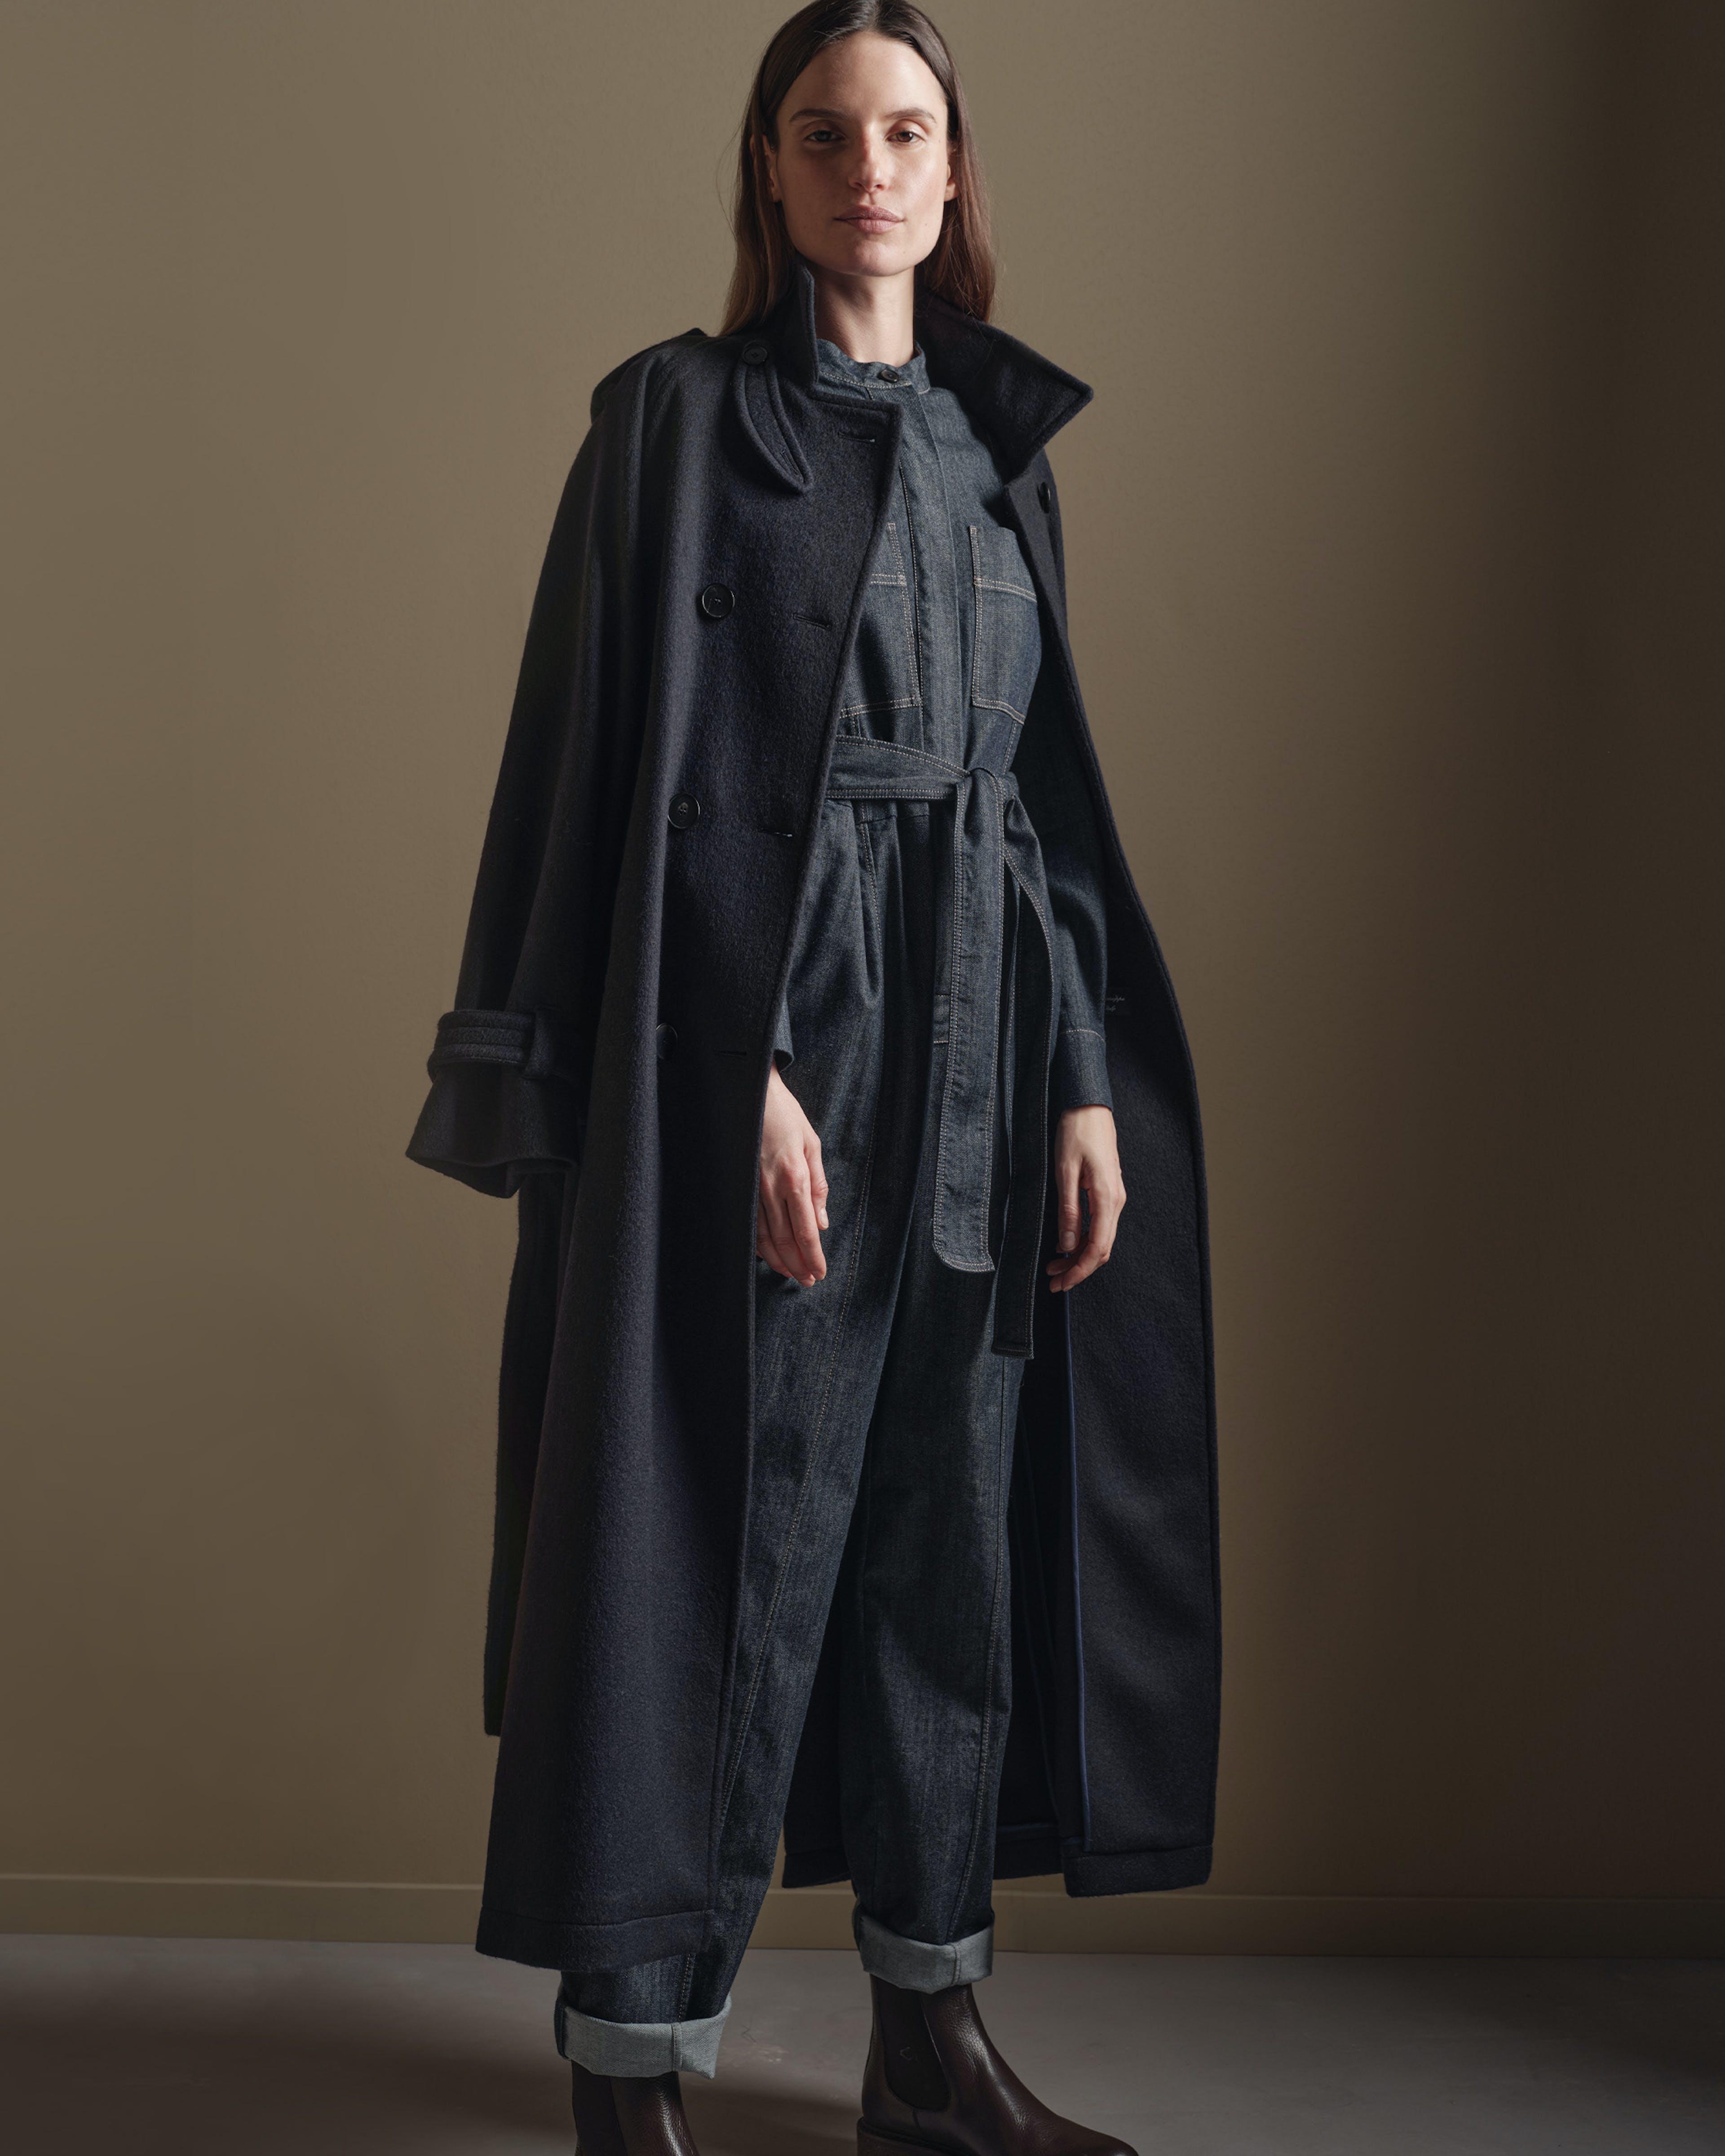 Damen Denim Outfit